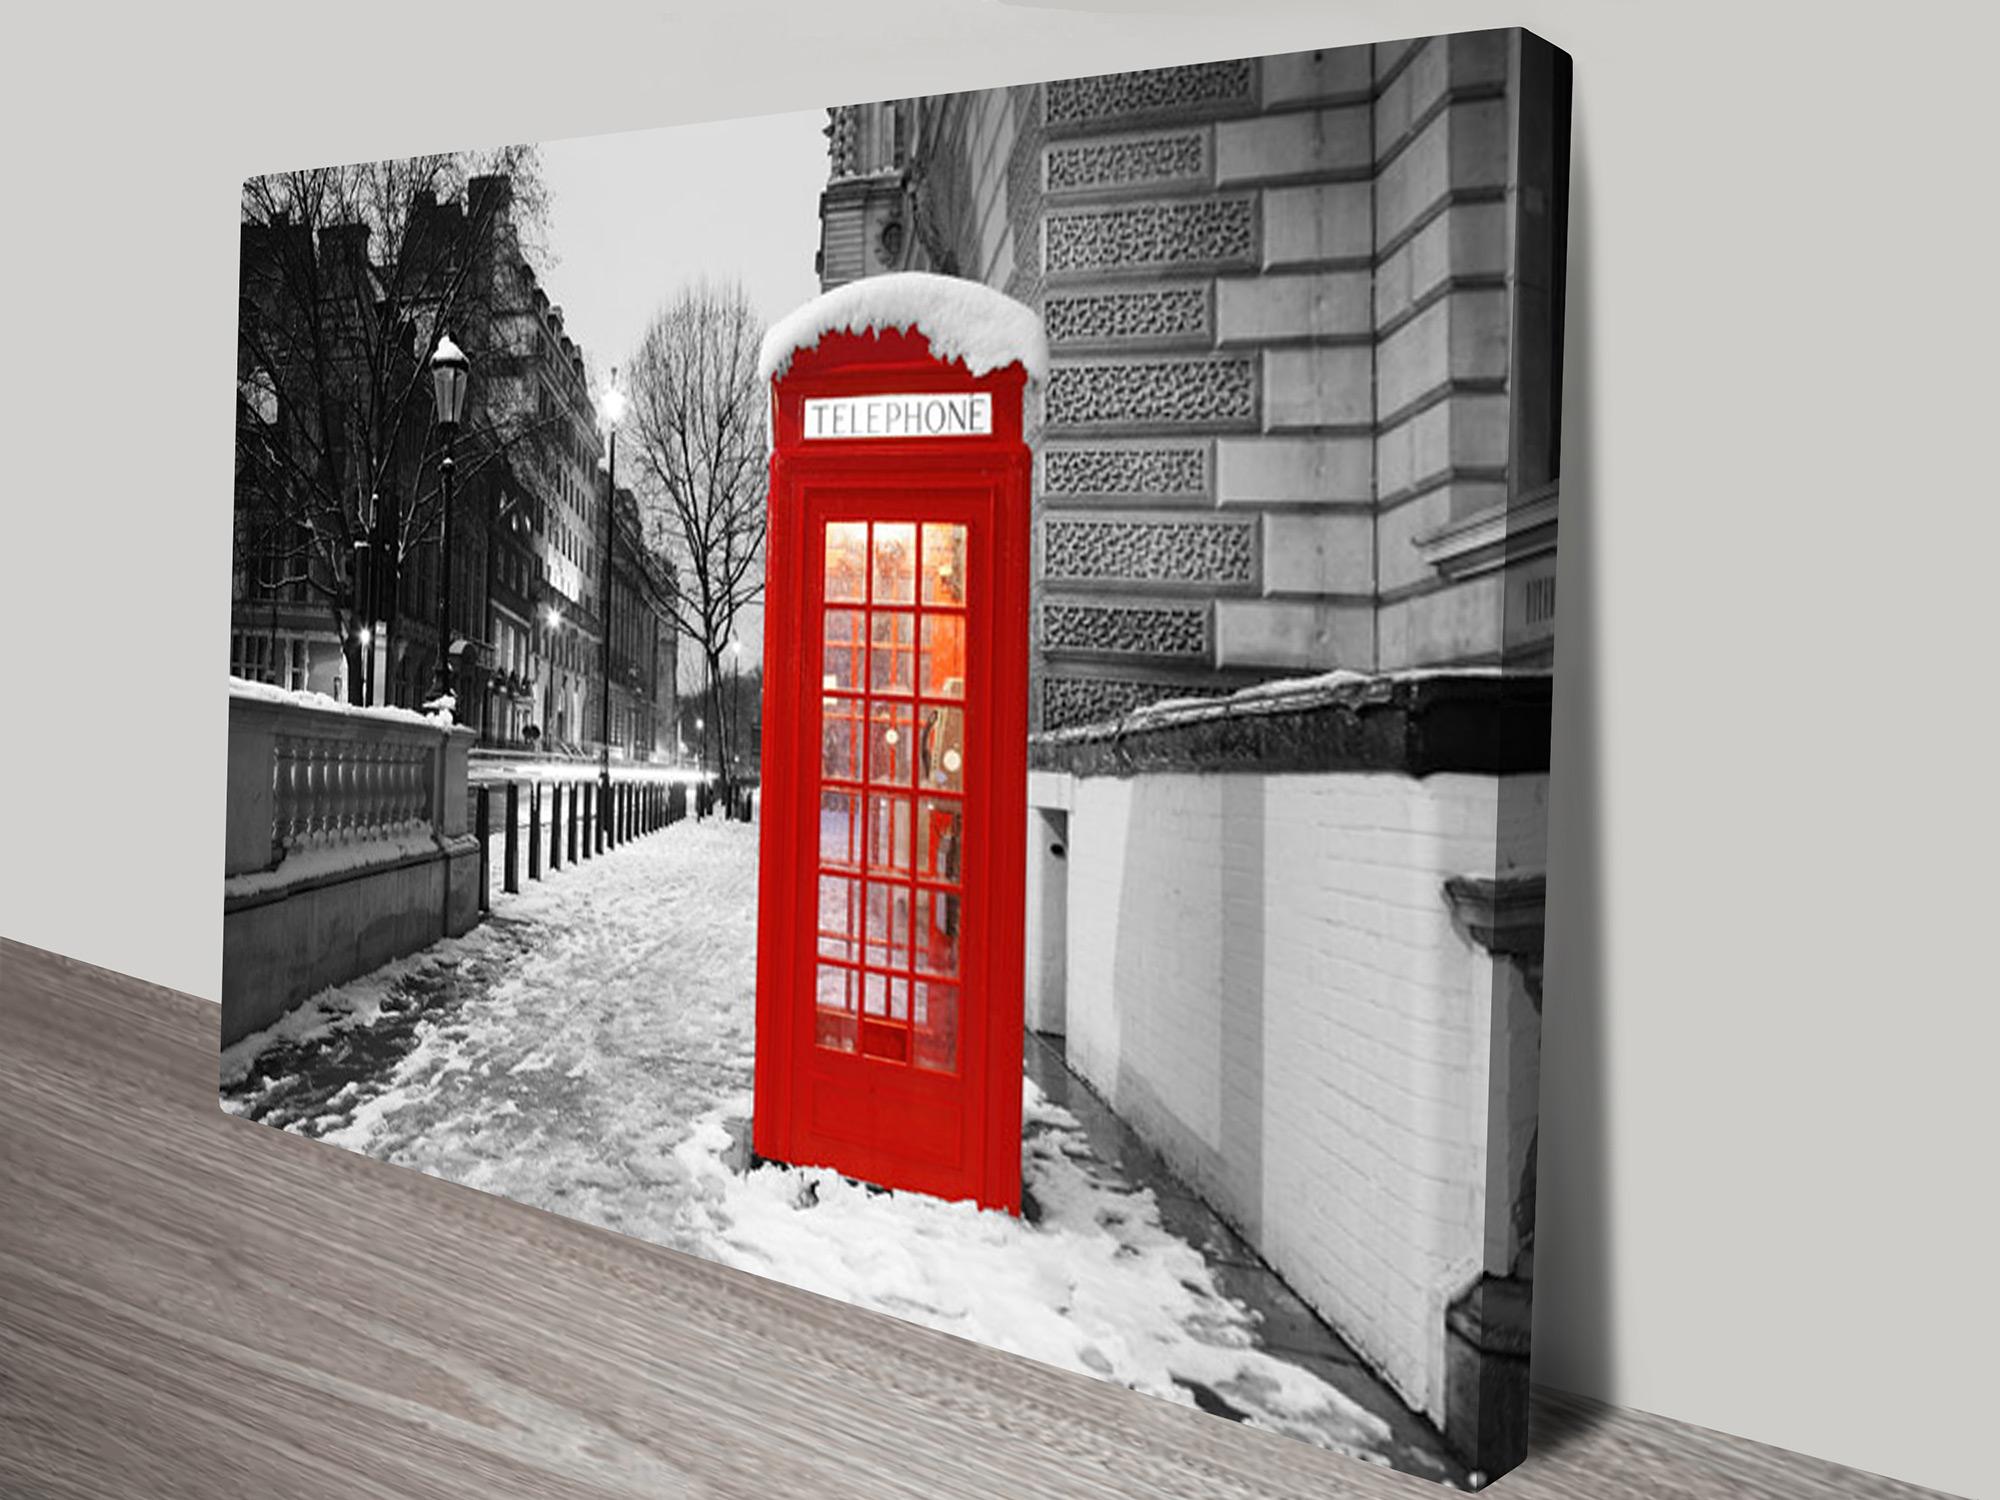 Wall Art Telephone Box : Old telephone box canvas photo print